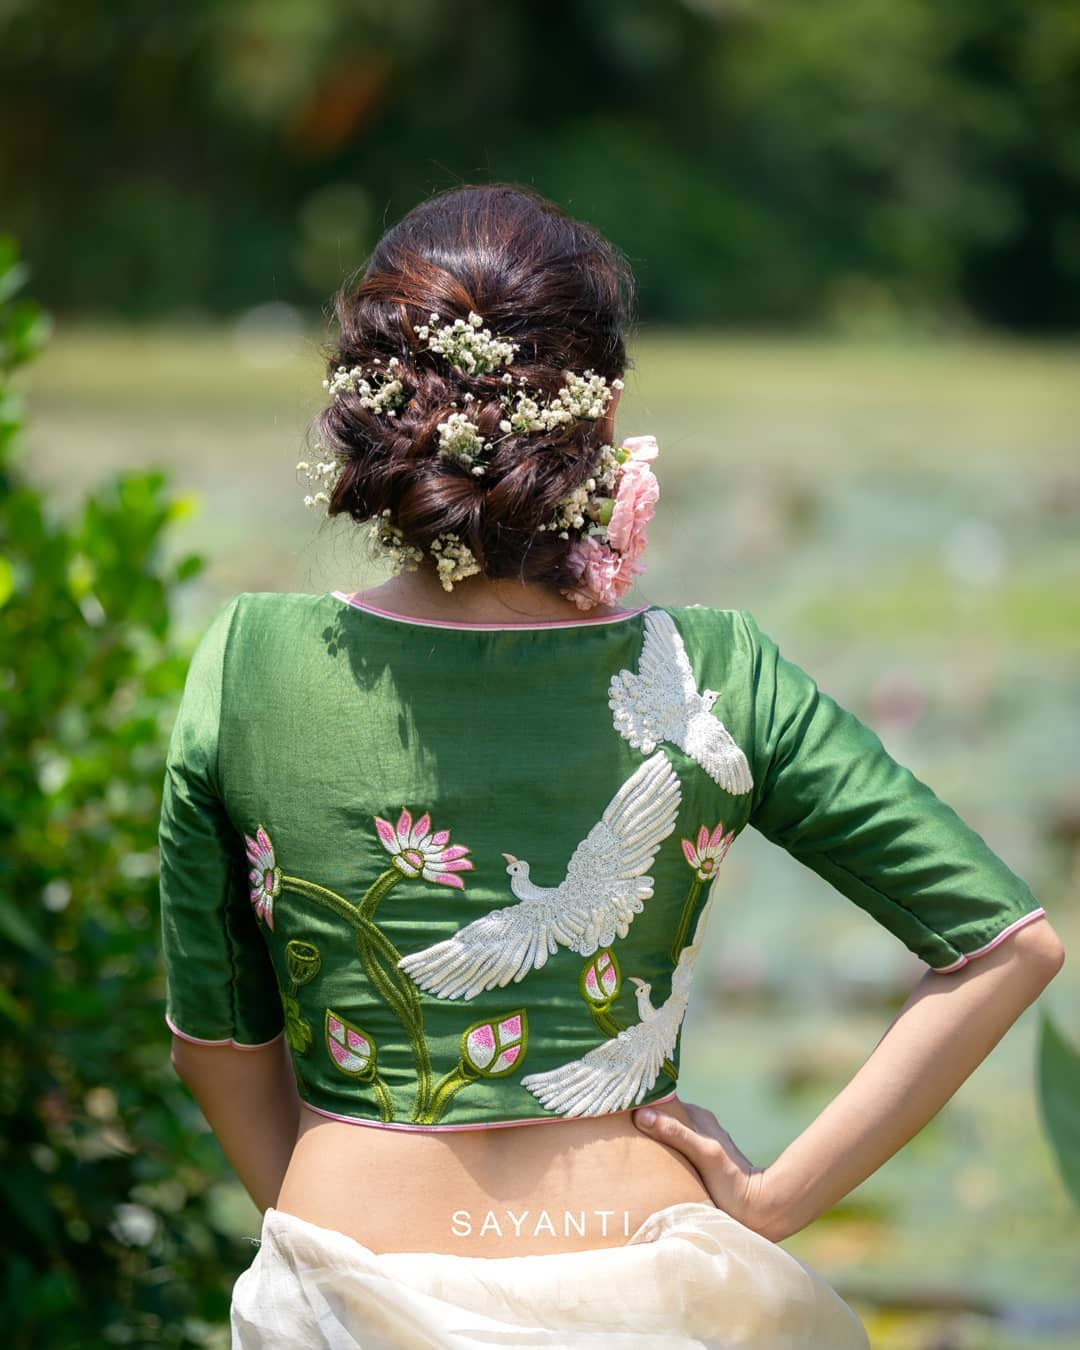 swan embroidery blouse-Sayanti Ghosh-1